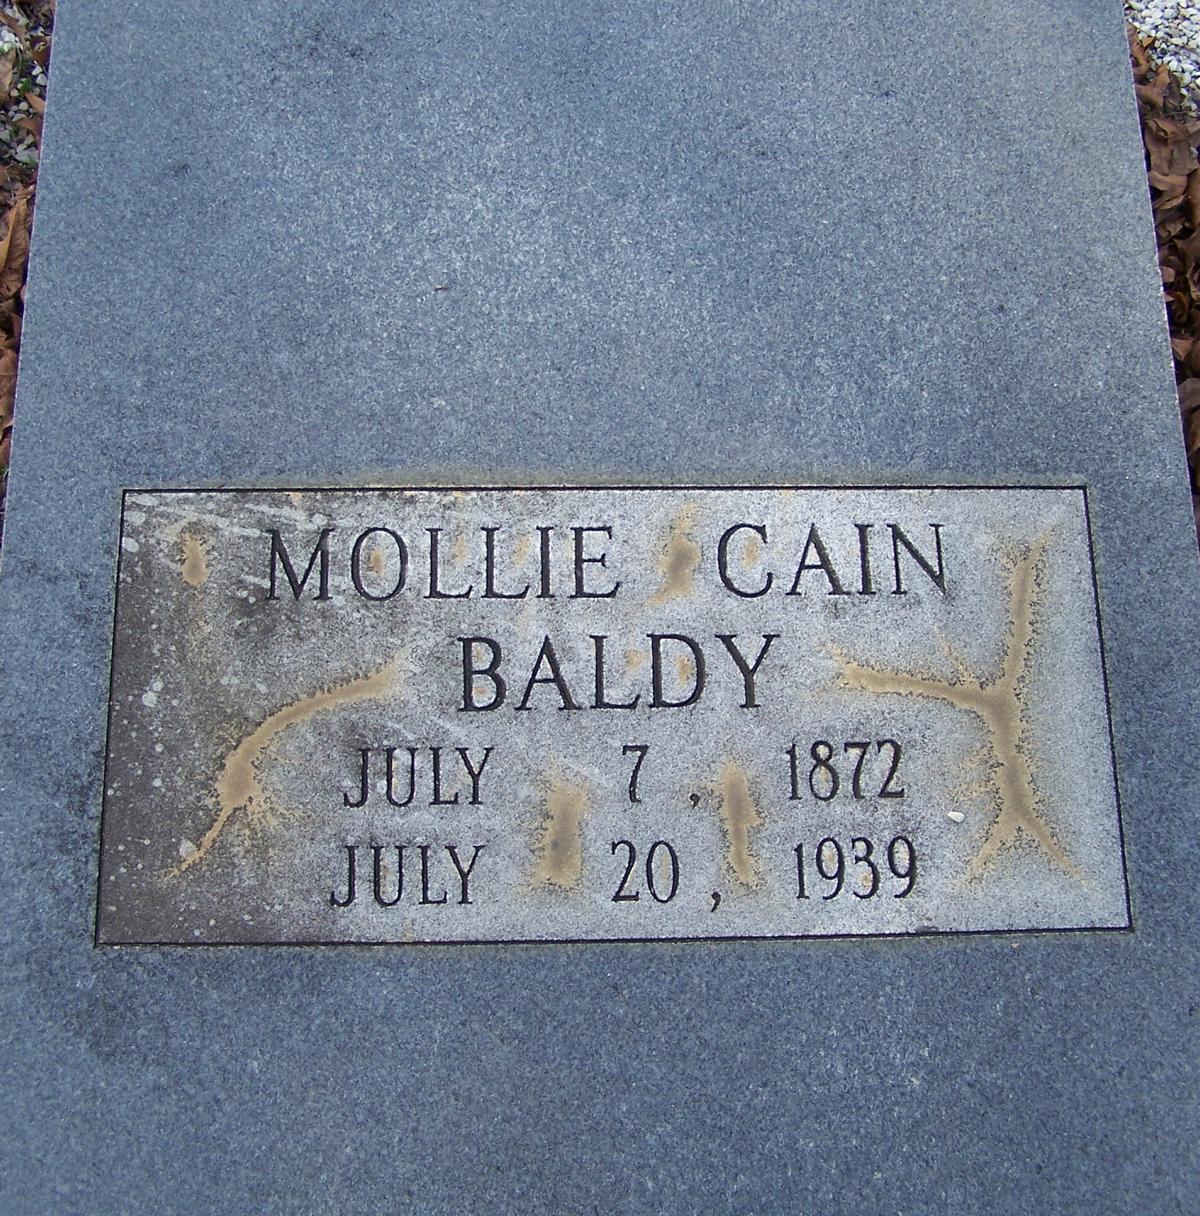 Mollie <i>Cain</i> Baldy